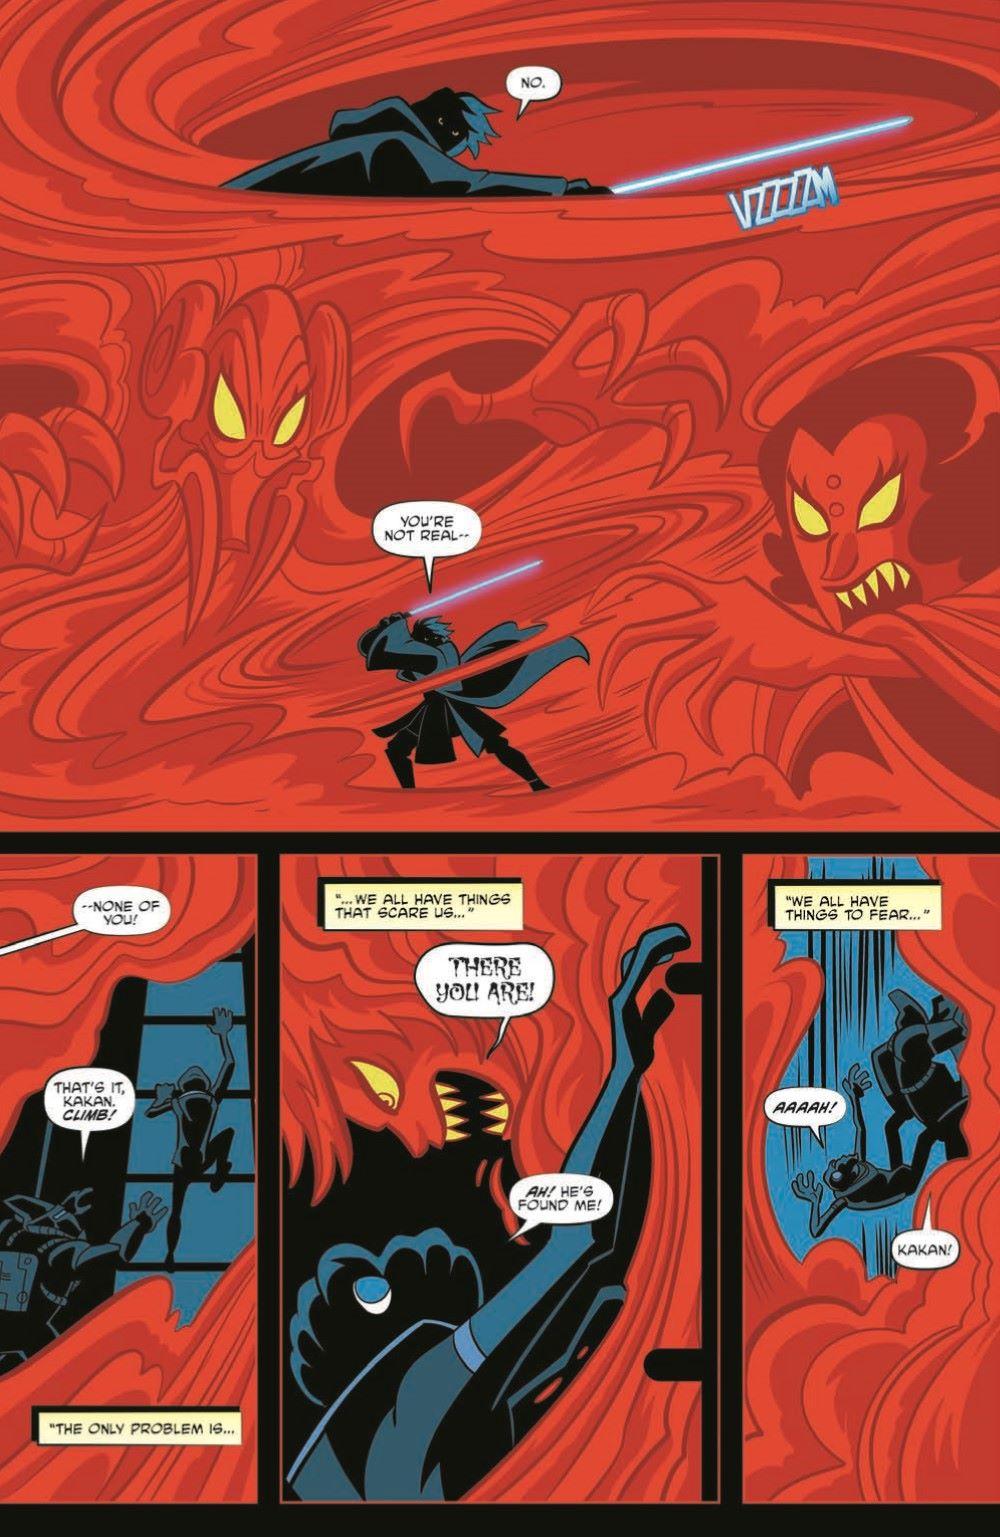 SW_ShadowOfVadersCastle_01-pr-7 ComicList Previews: STAR WARS ADVENTURES SHADOW OF VADER'S CASTLE #1